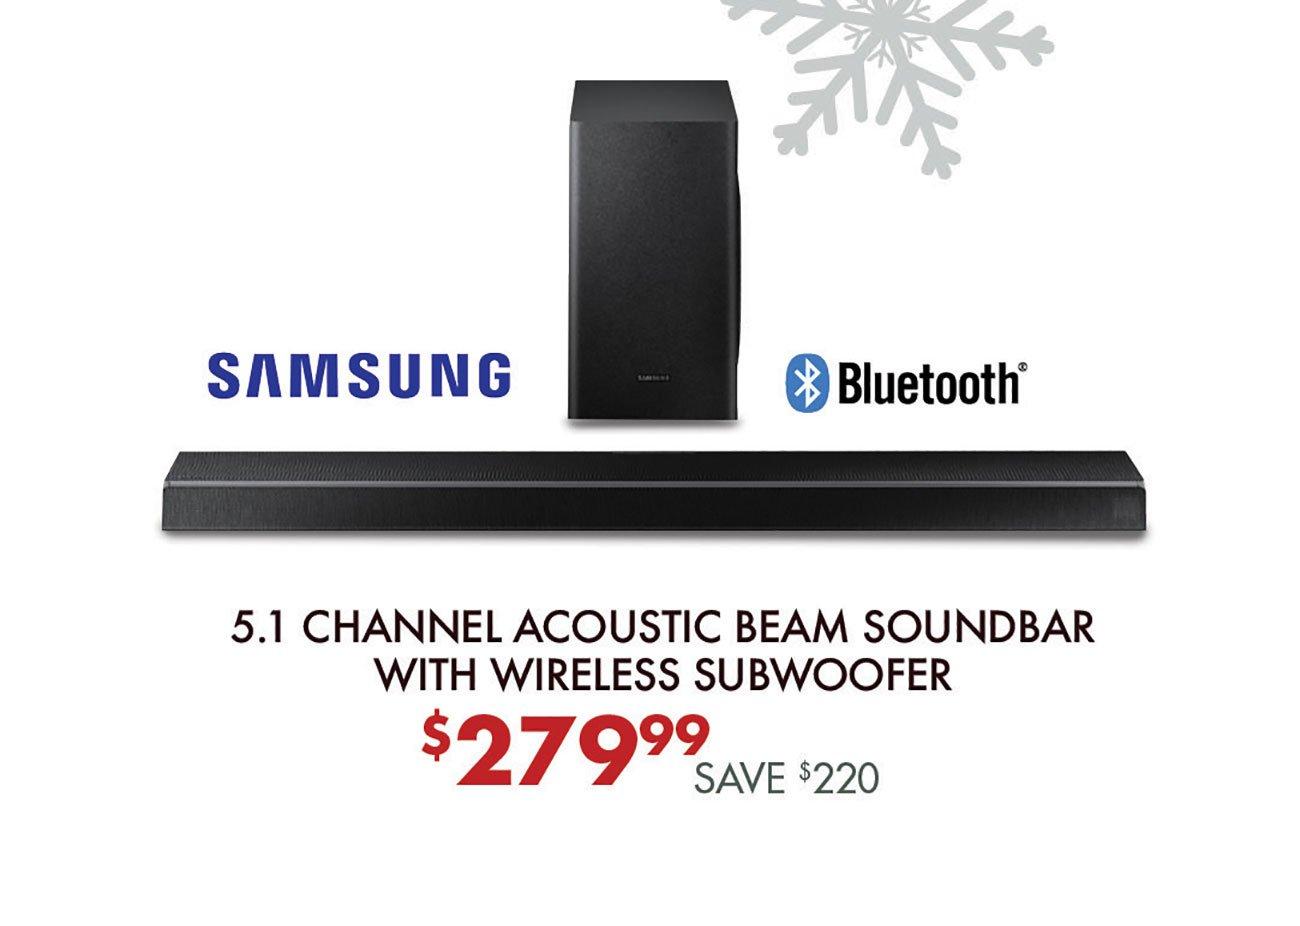 Samsung-Acoustic-Beam-Soundbar-Subwoofer